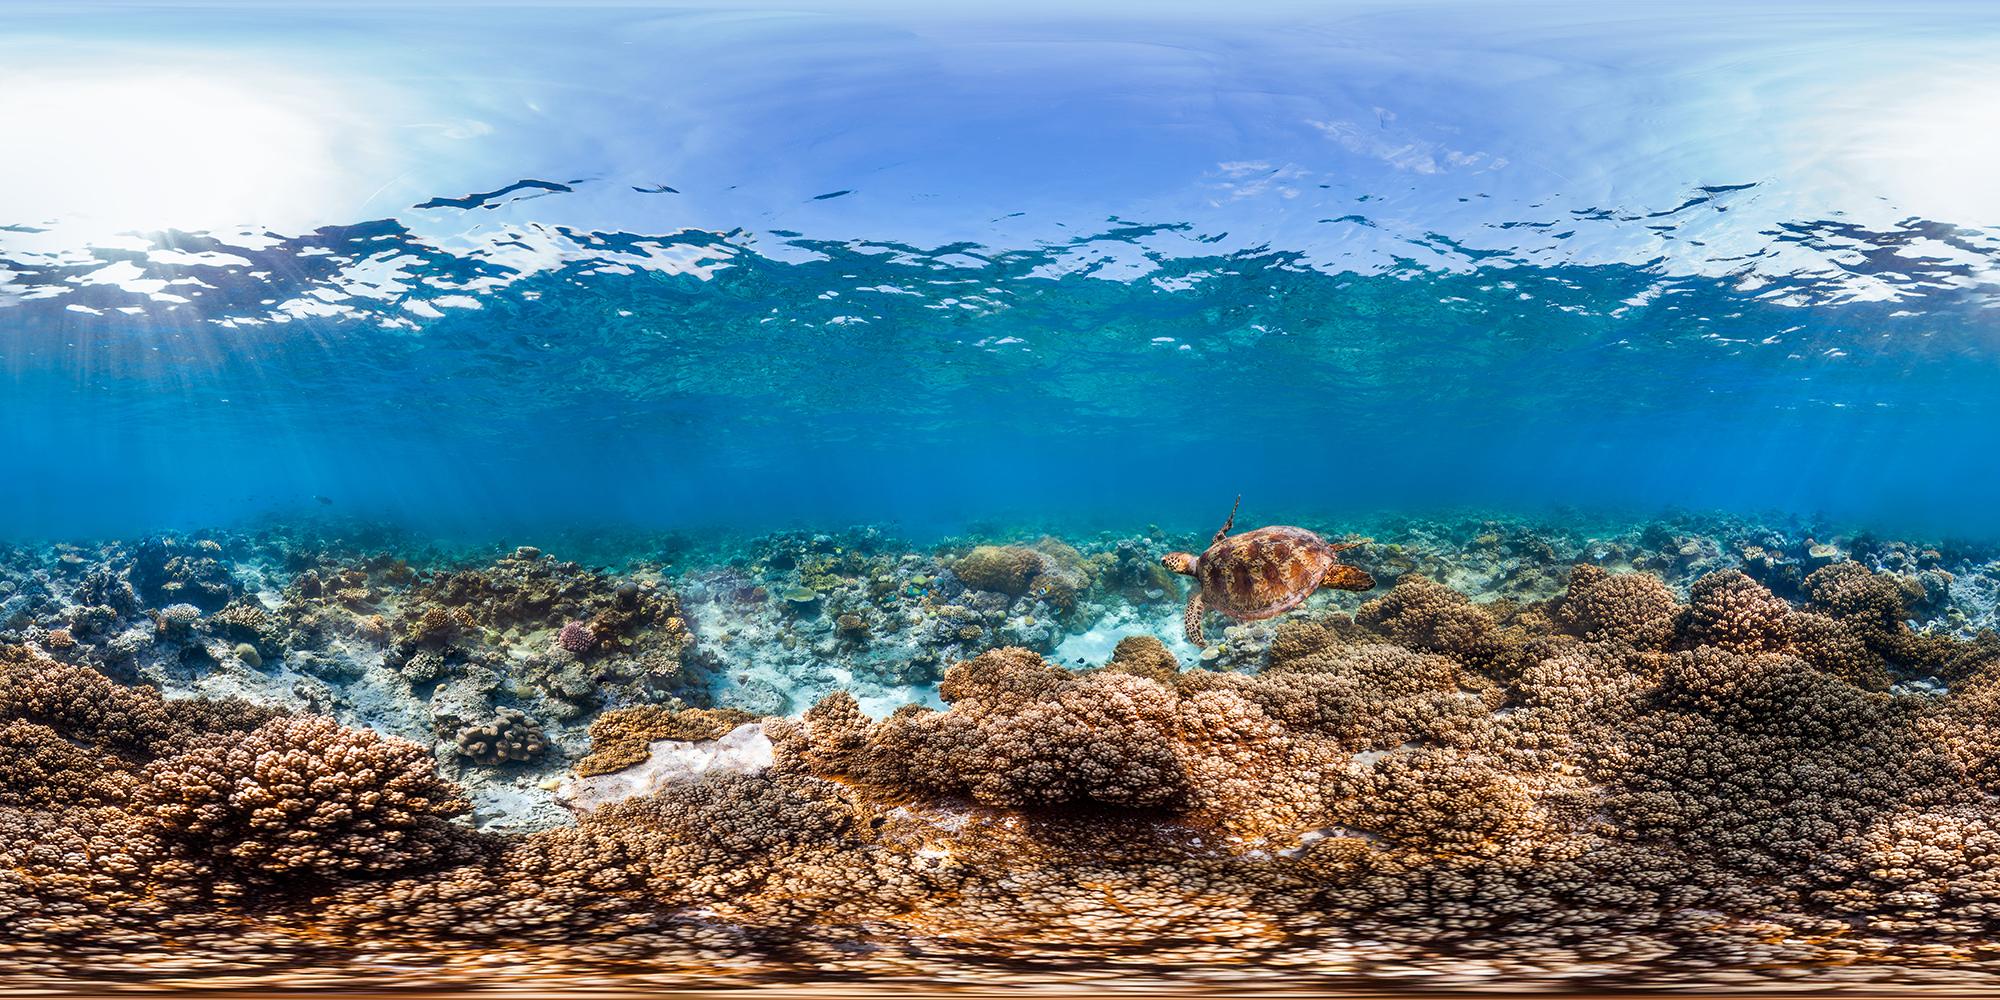 norman REEF, GREAT BARRIER REEF CREDIT: THE OCEAN AGENCY / XL CATLIN SEAVIEW SURVEY